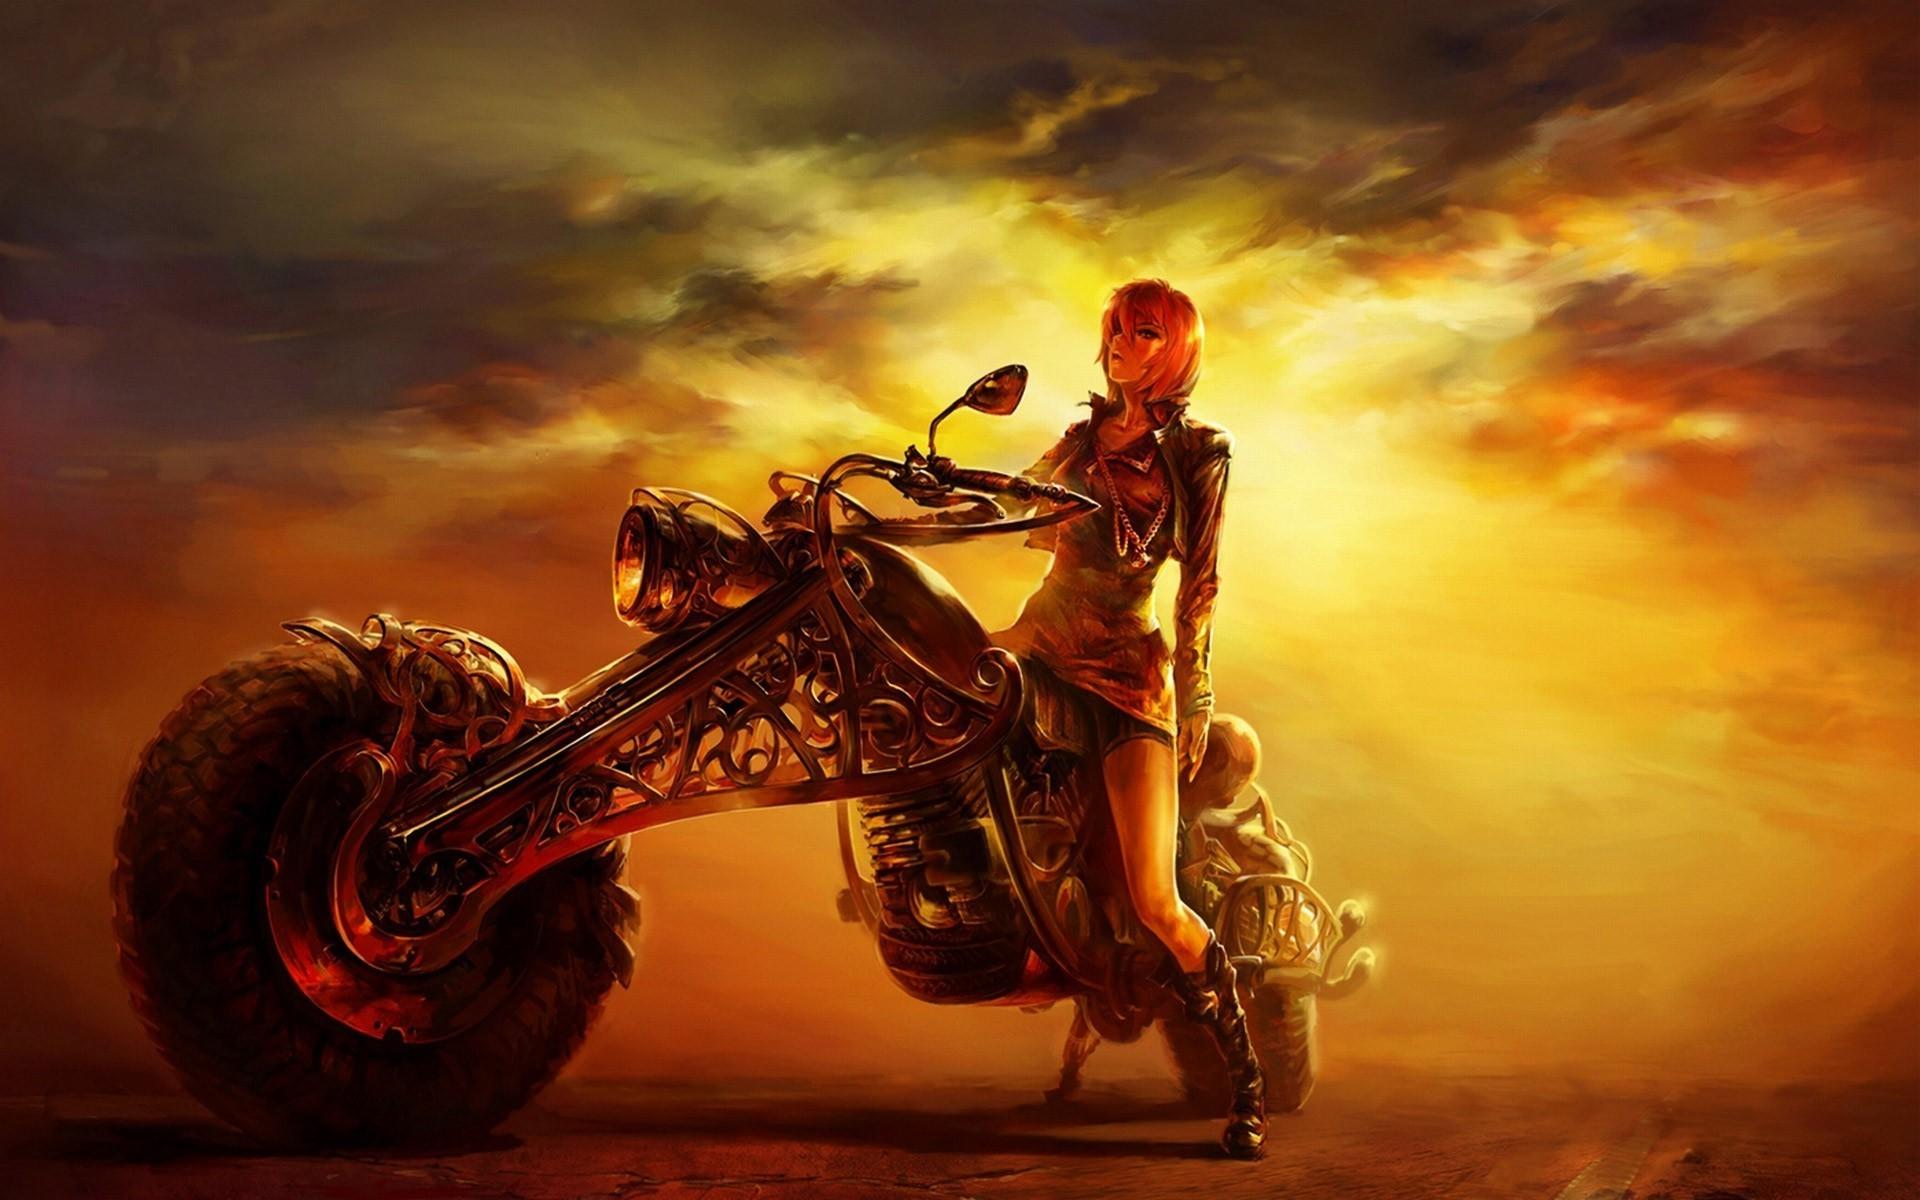 Bikes & Girls wallpapers   Motorcycle Girl   Pinterest   Girl wallpaper and  Biker chick